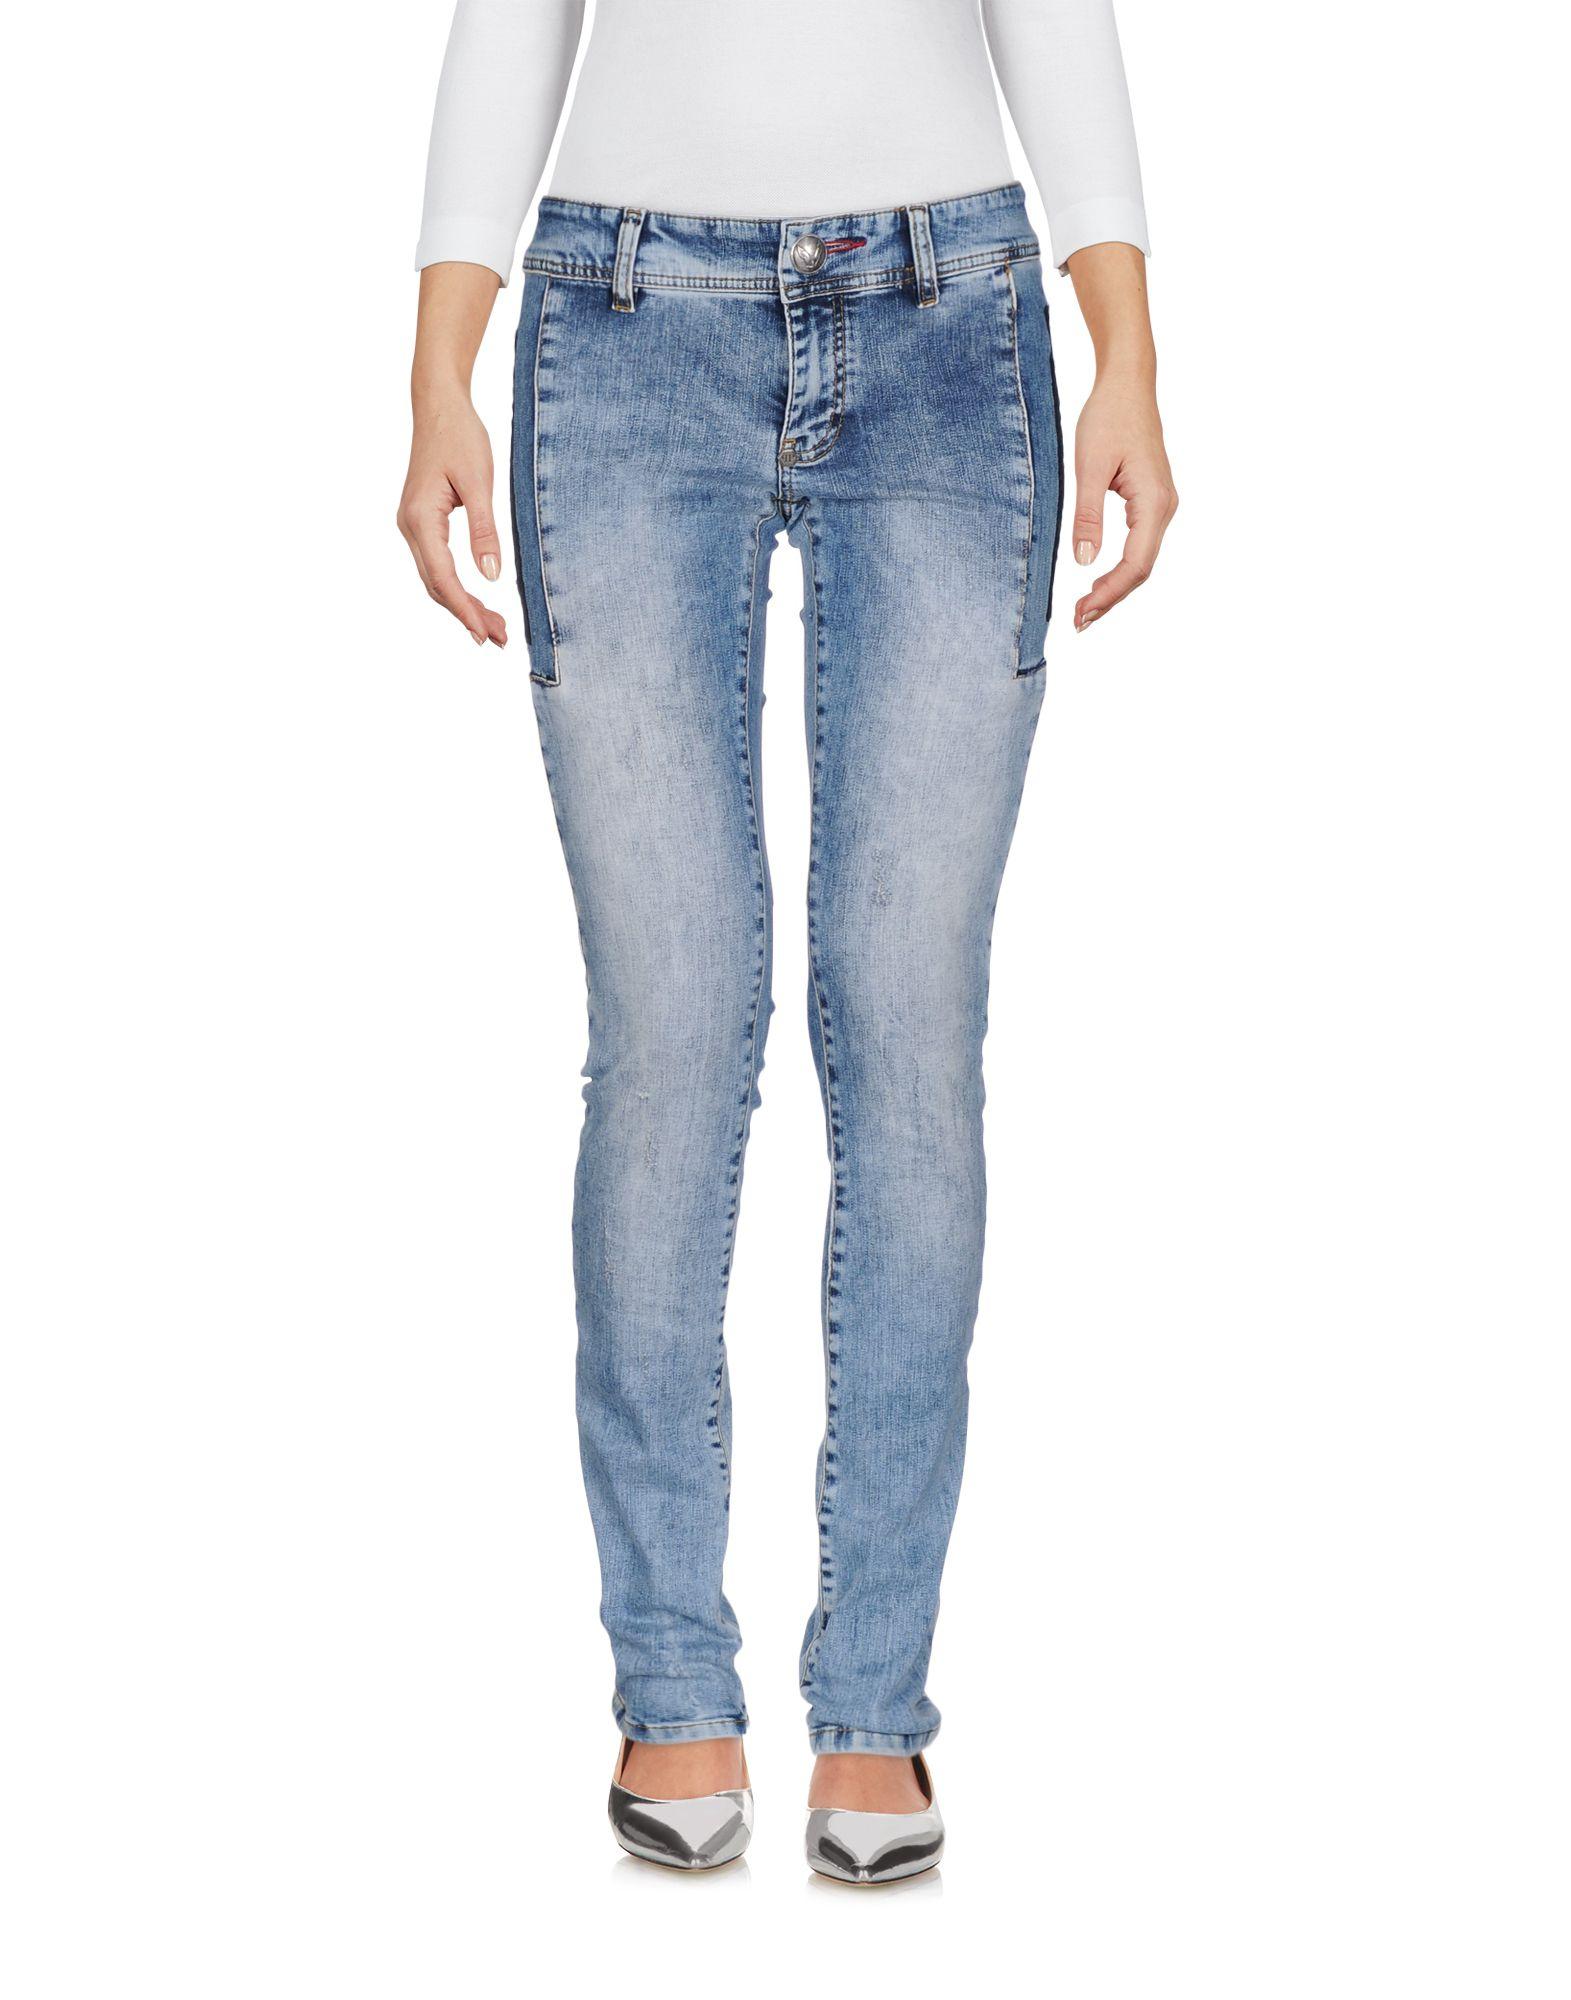 Pantaloni Jeans Philipp Plein Donna - Acquista online su H3xLCrFV